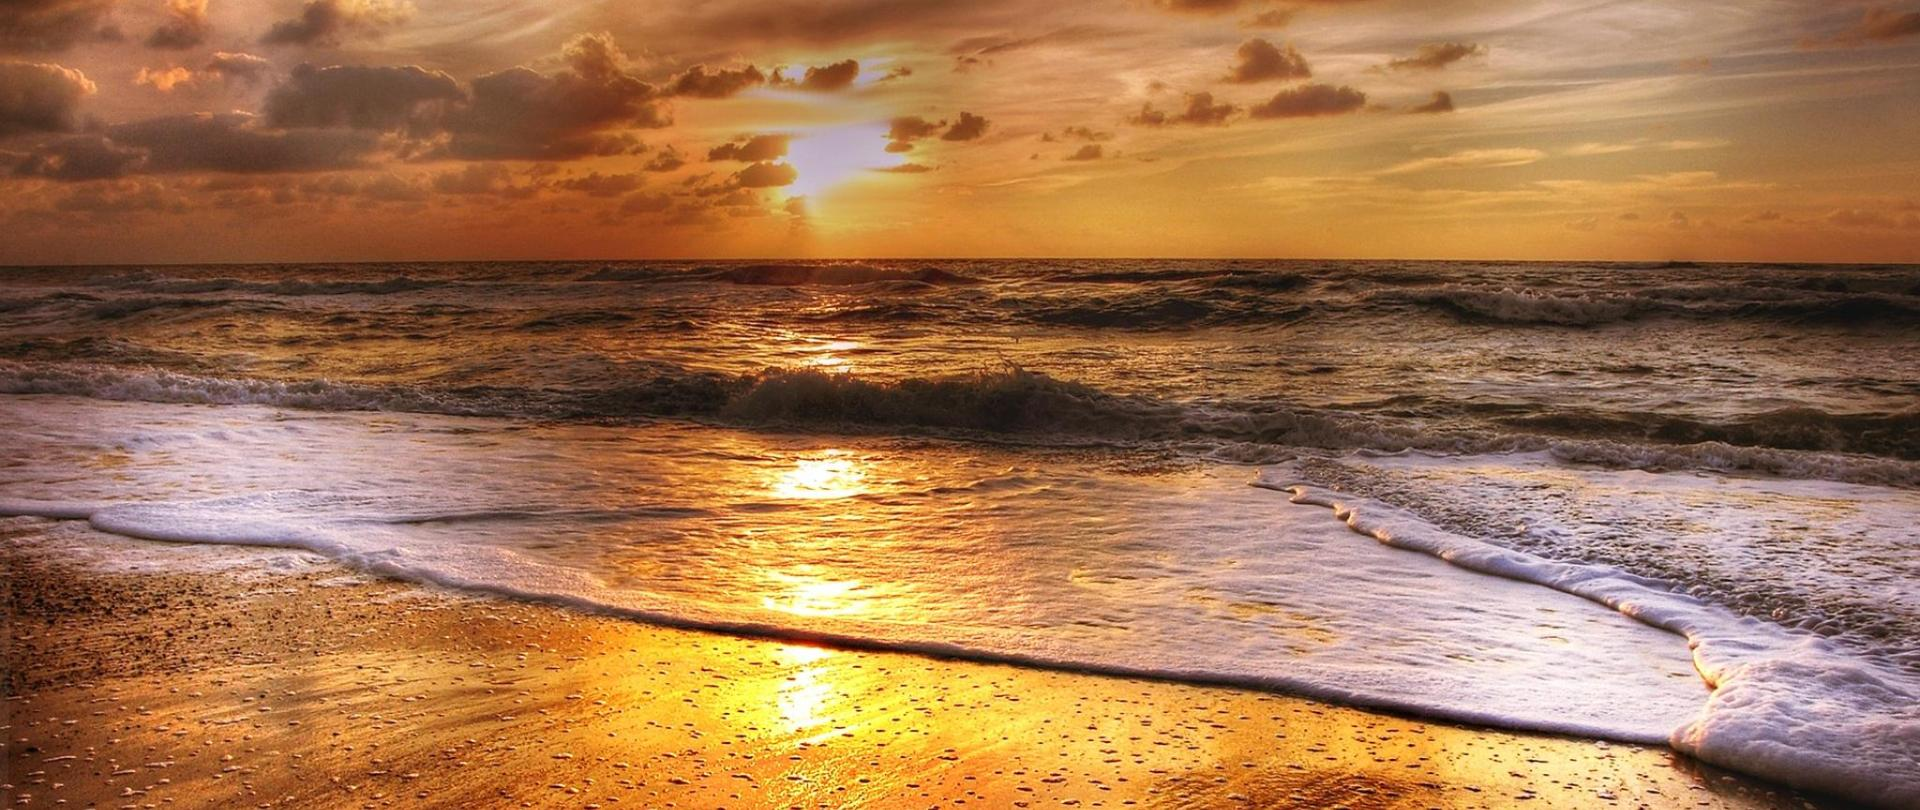 sunset-2205553_1920.jpg